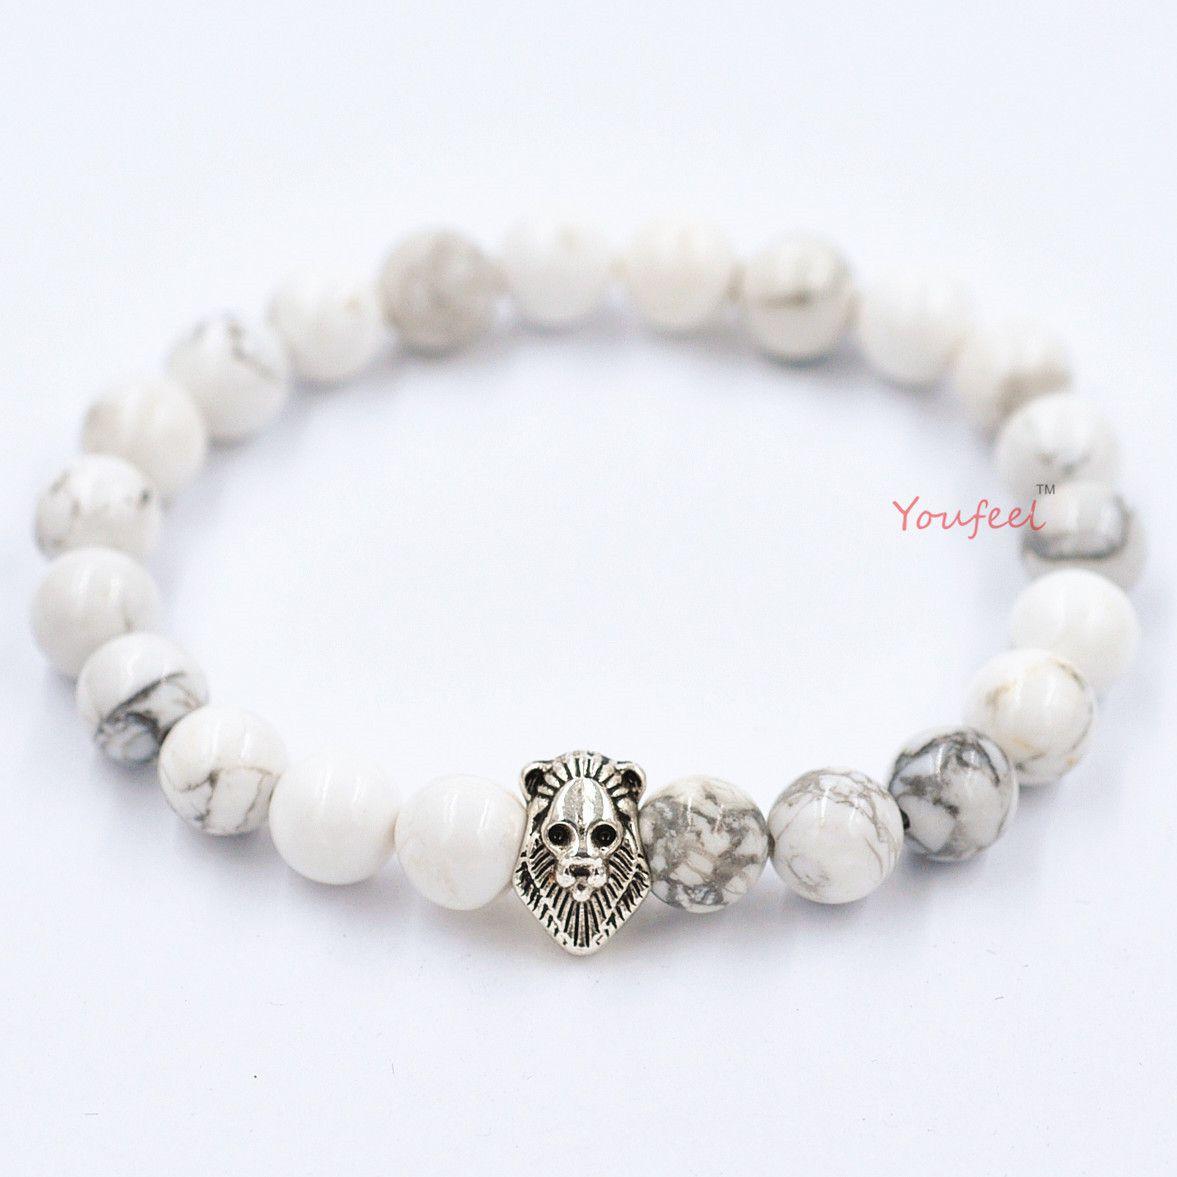 High quality bead bracelets Bohemian natural agate beads bracelets evil transit Lion head bracelets free shipping